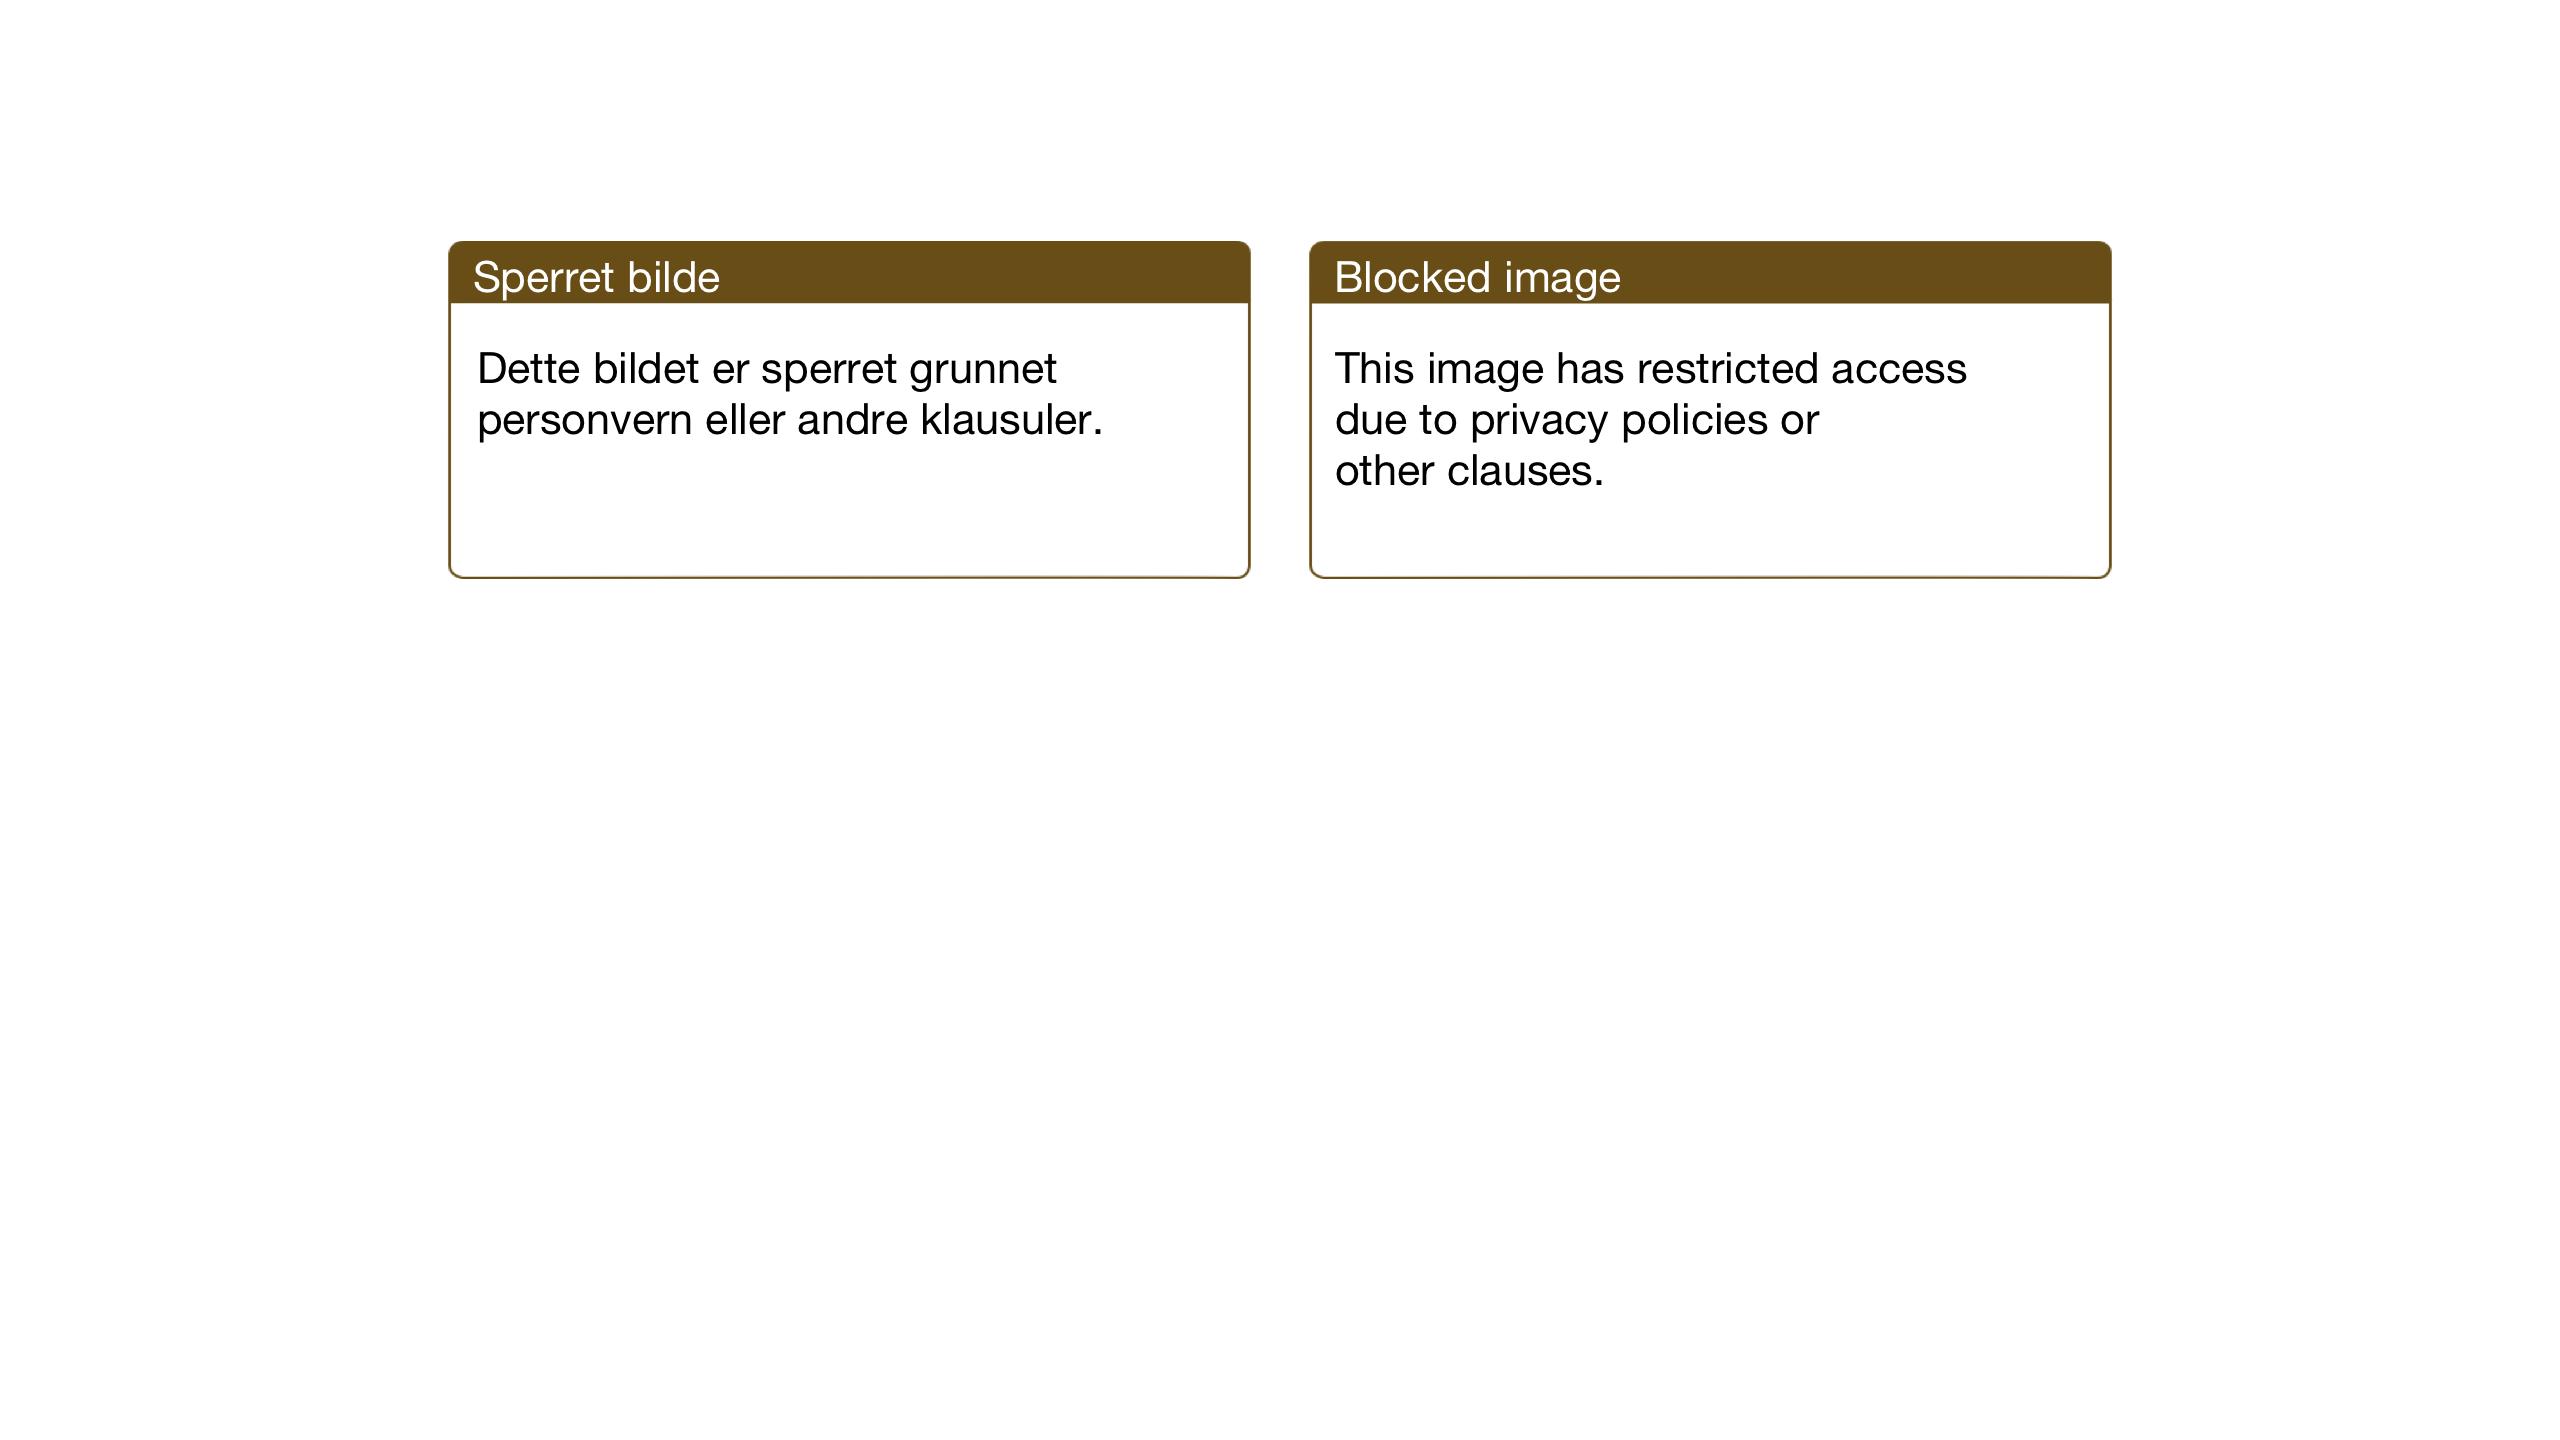 SAT, Ministerialprotokoller, klokkerbøker og fødselsregistre - Sør-Trøndelag, 675/L0888: Parish register (copy) no. 675C01, 1913-1935, p. 65